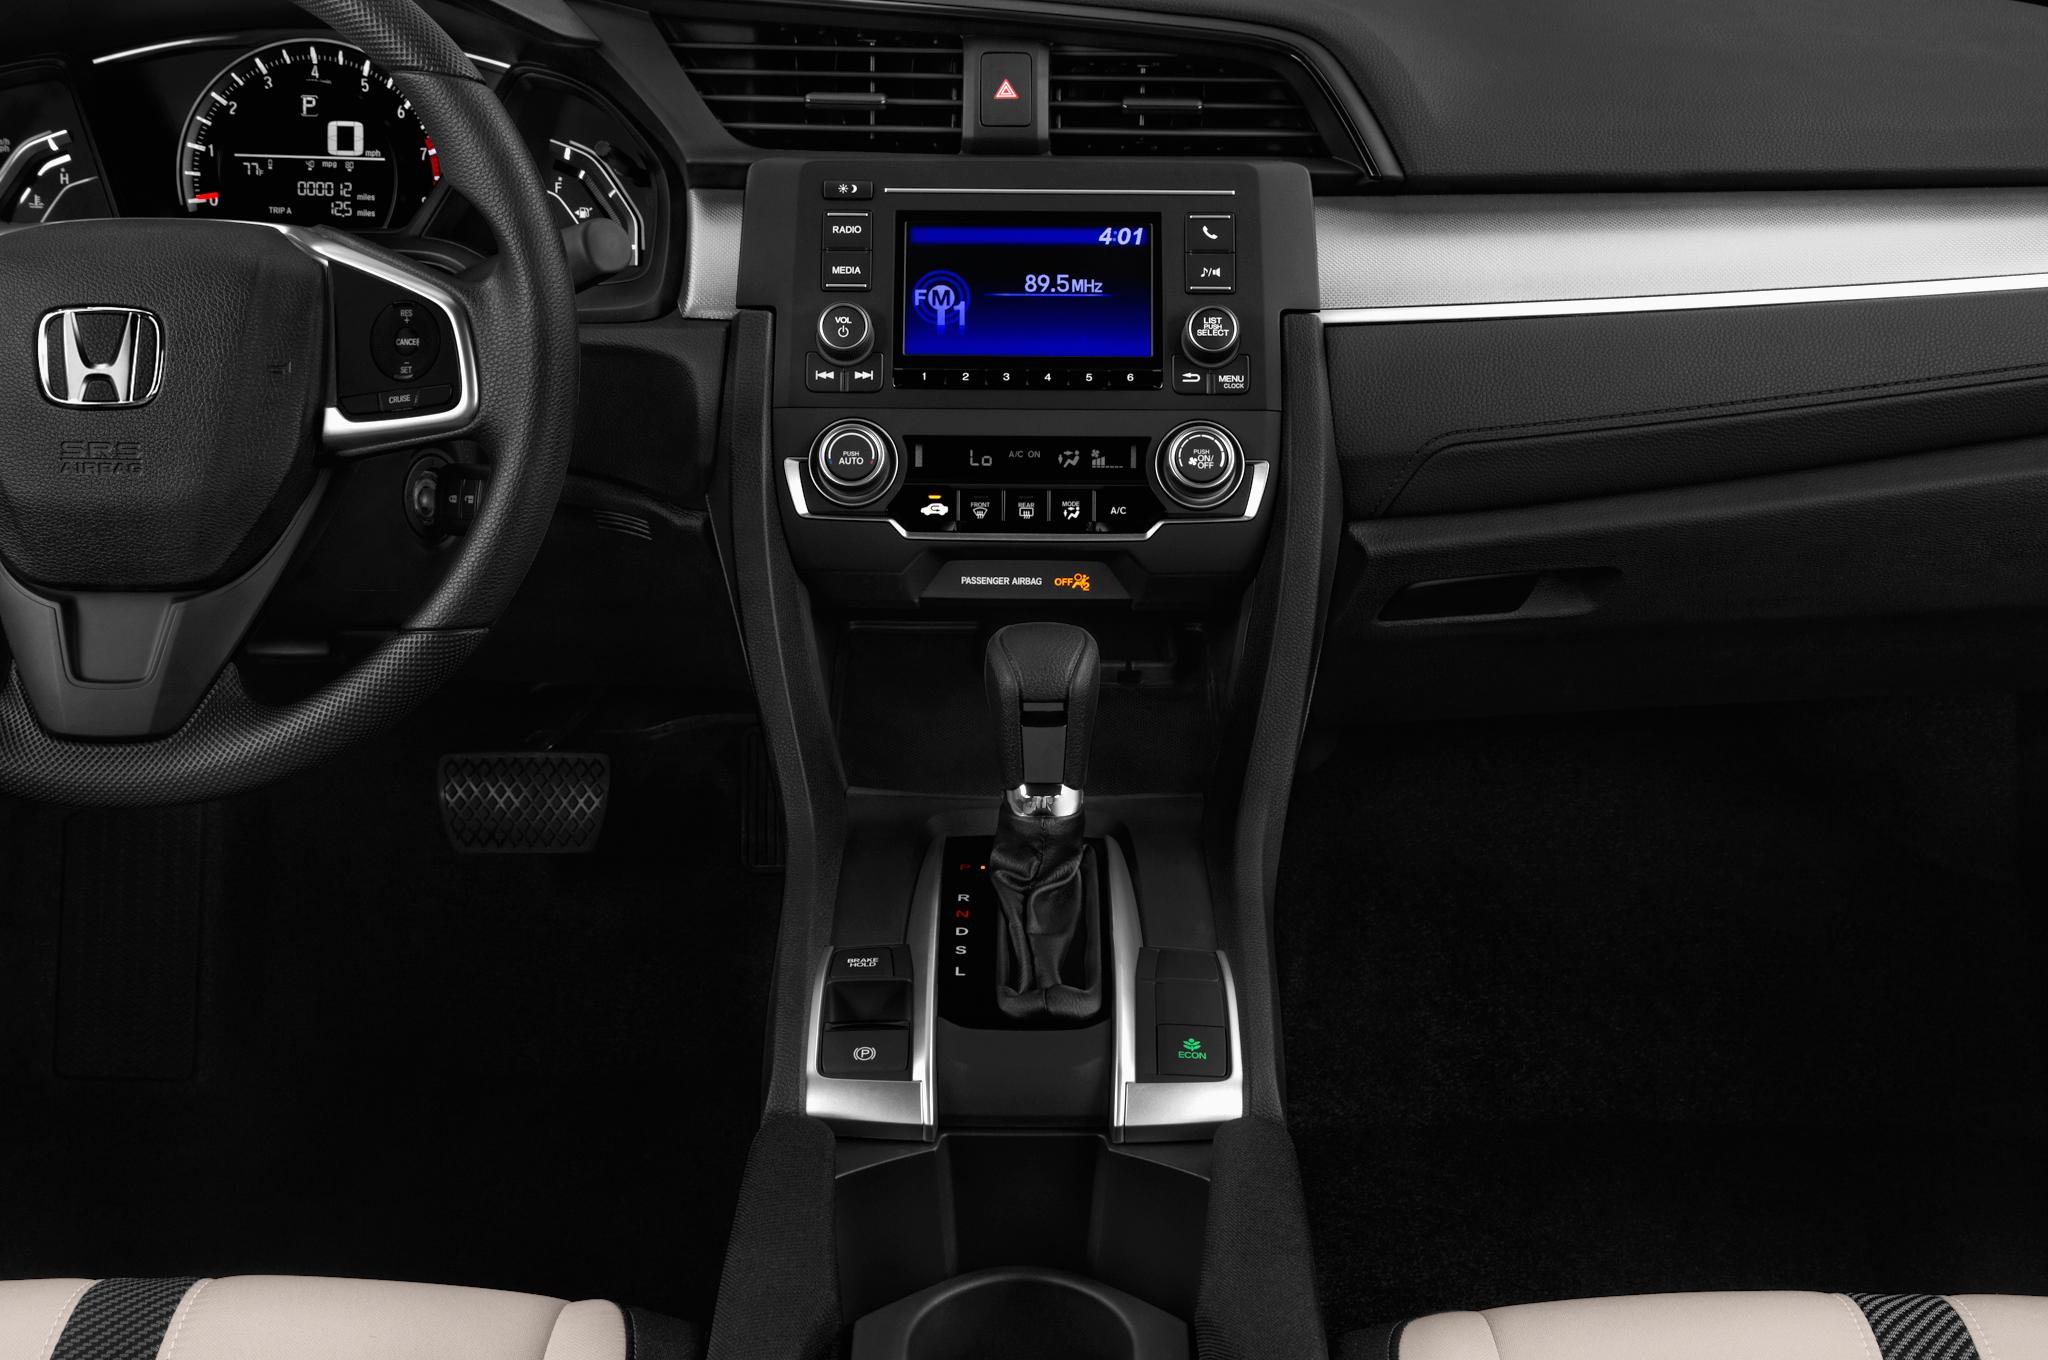 2016 Honda Civic Coupe Pricing Detailed Starts At 19 885